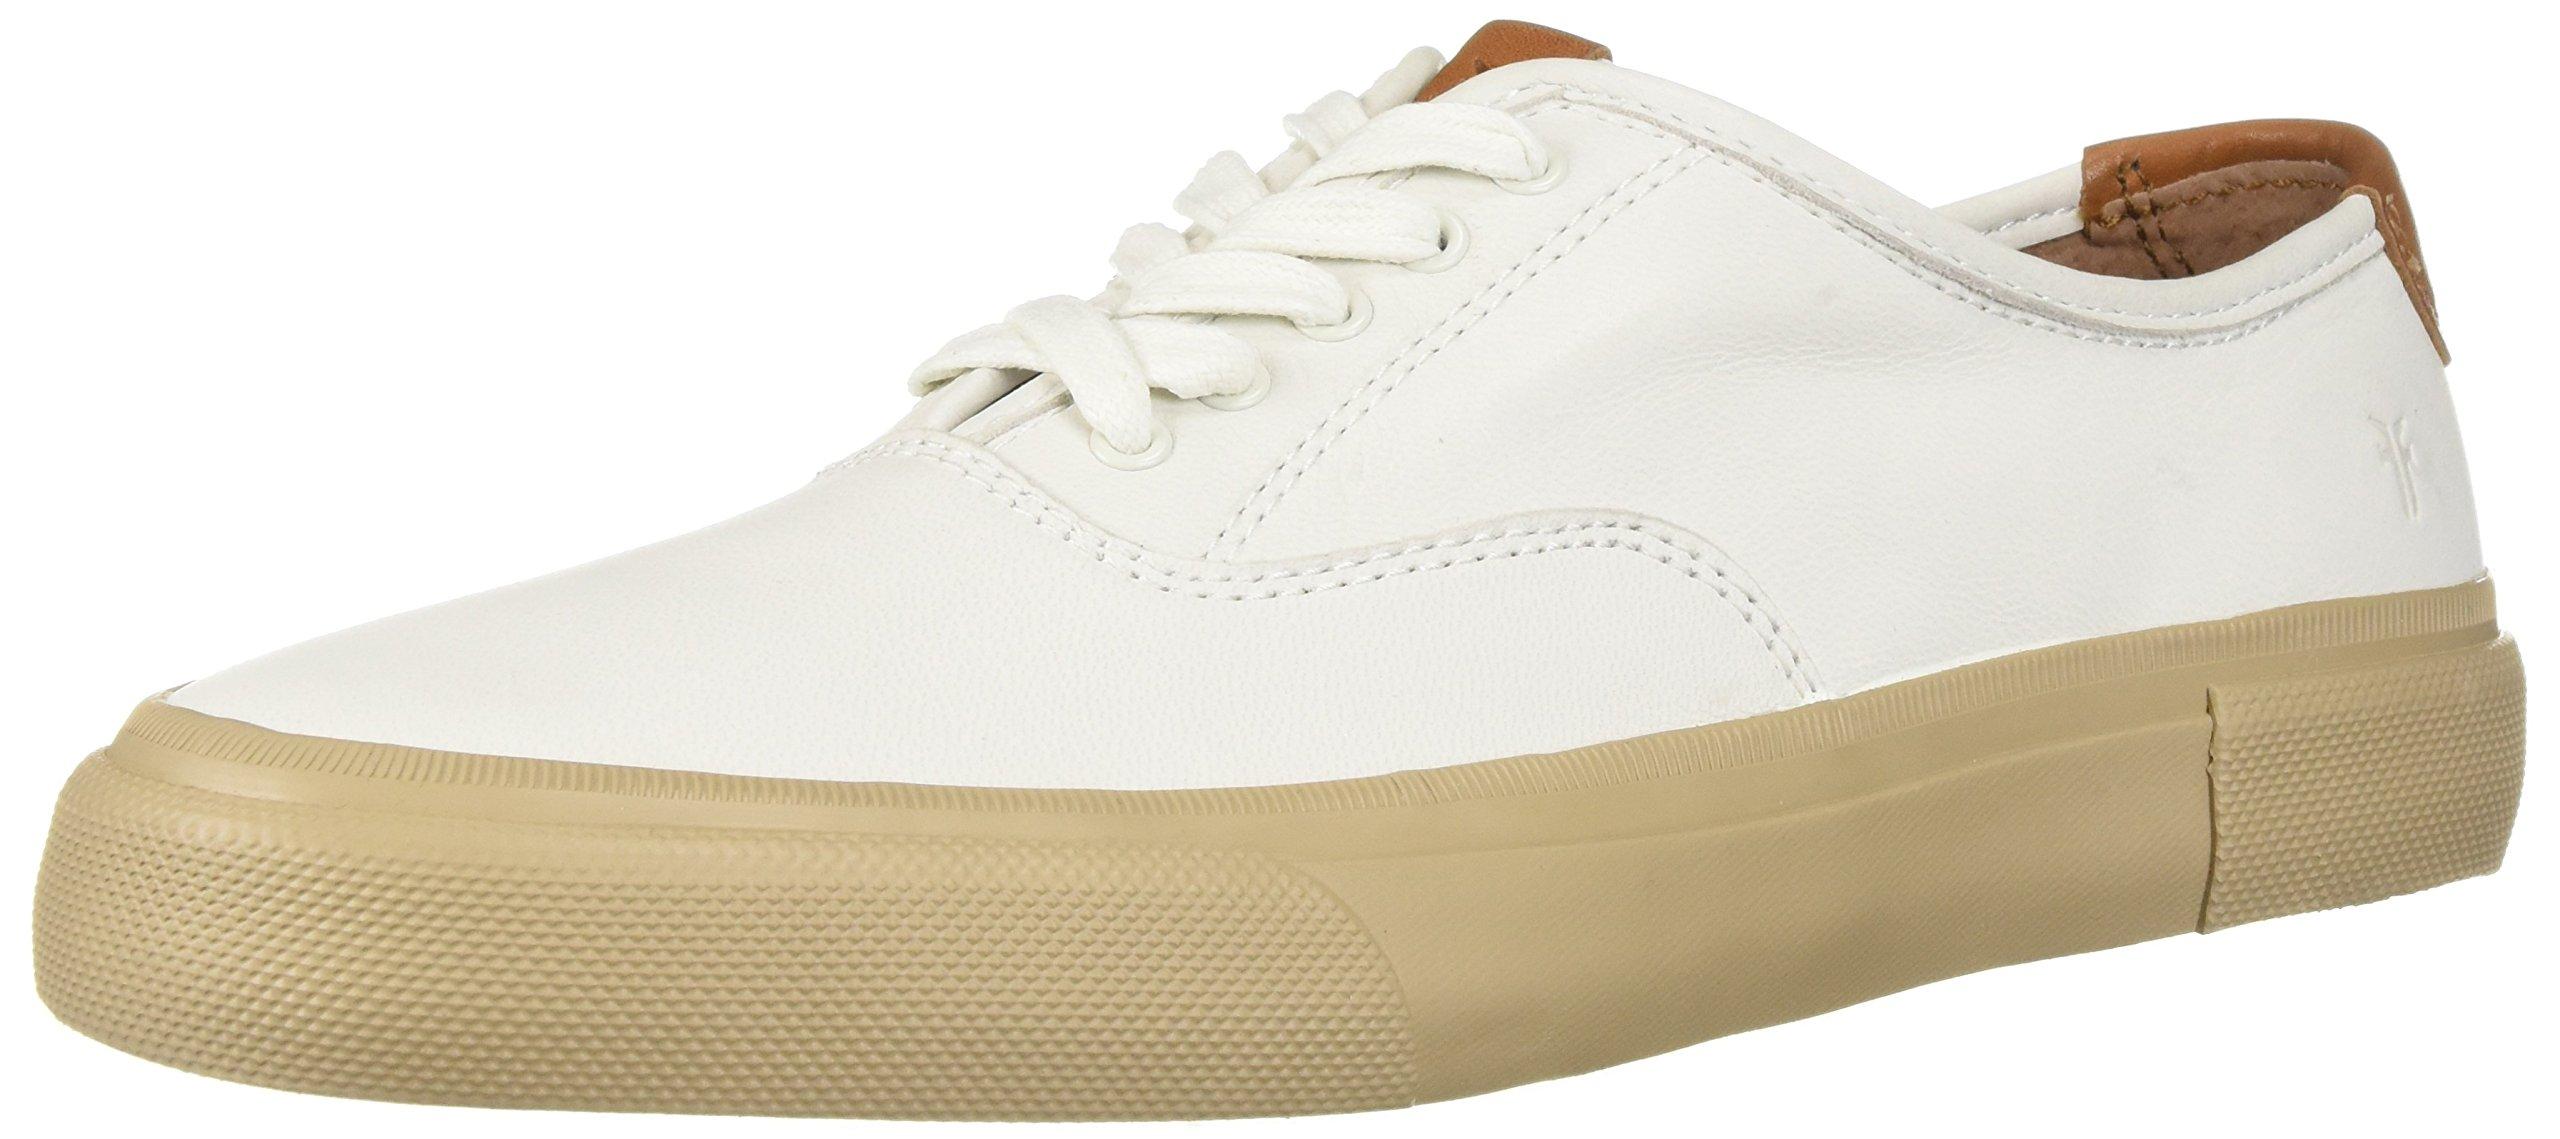 FRYE Men's Ludlow Bal Oxford Sneaker, White, 12 Medium US